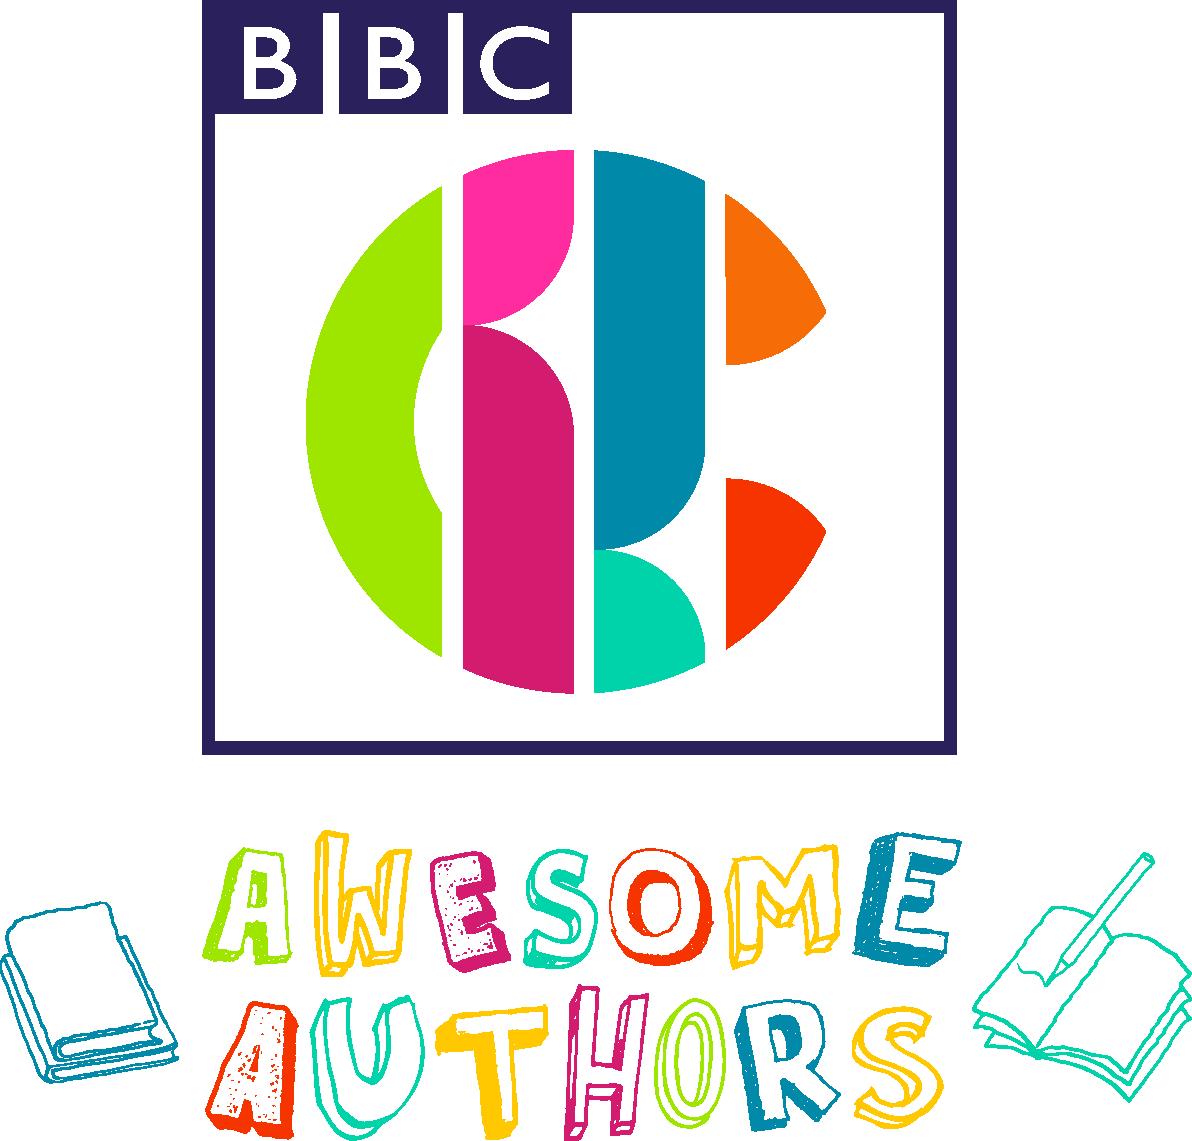 cbbc-awesome-authors-logo-dark-screen